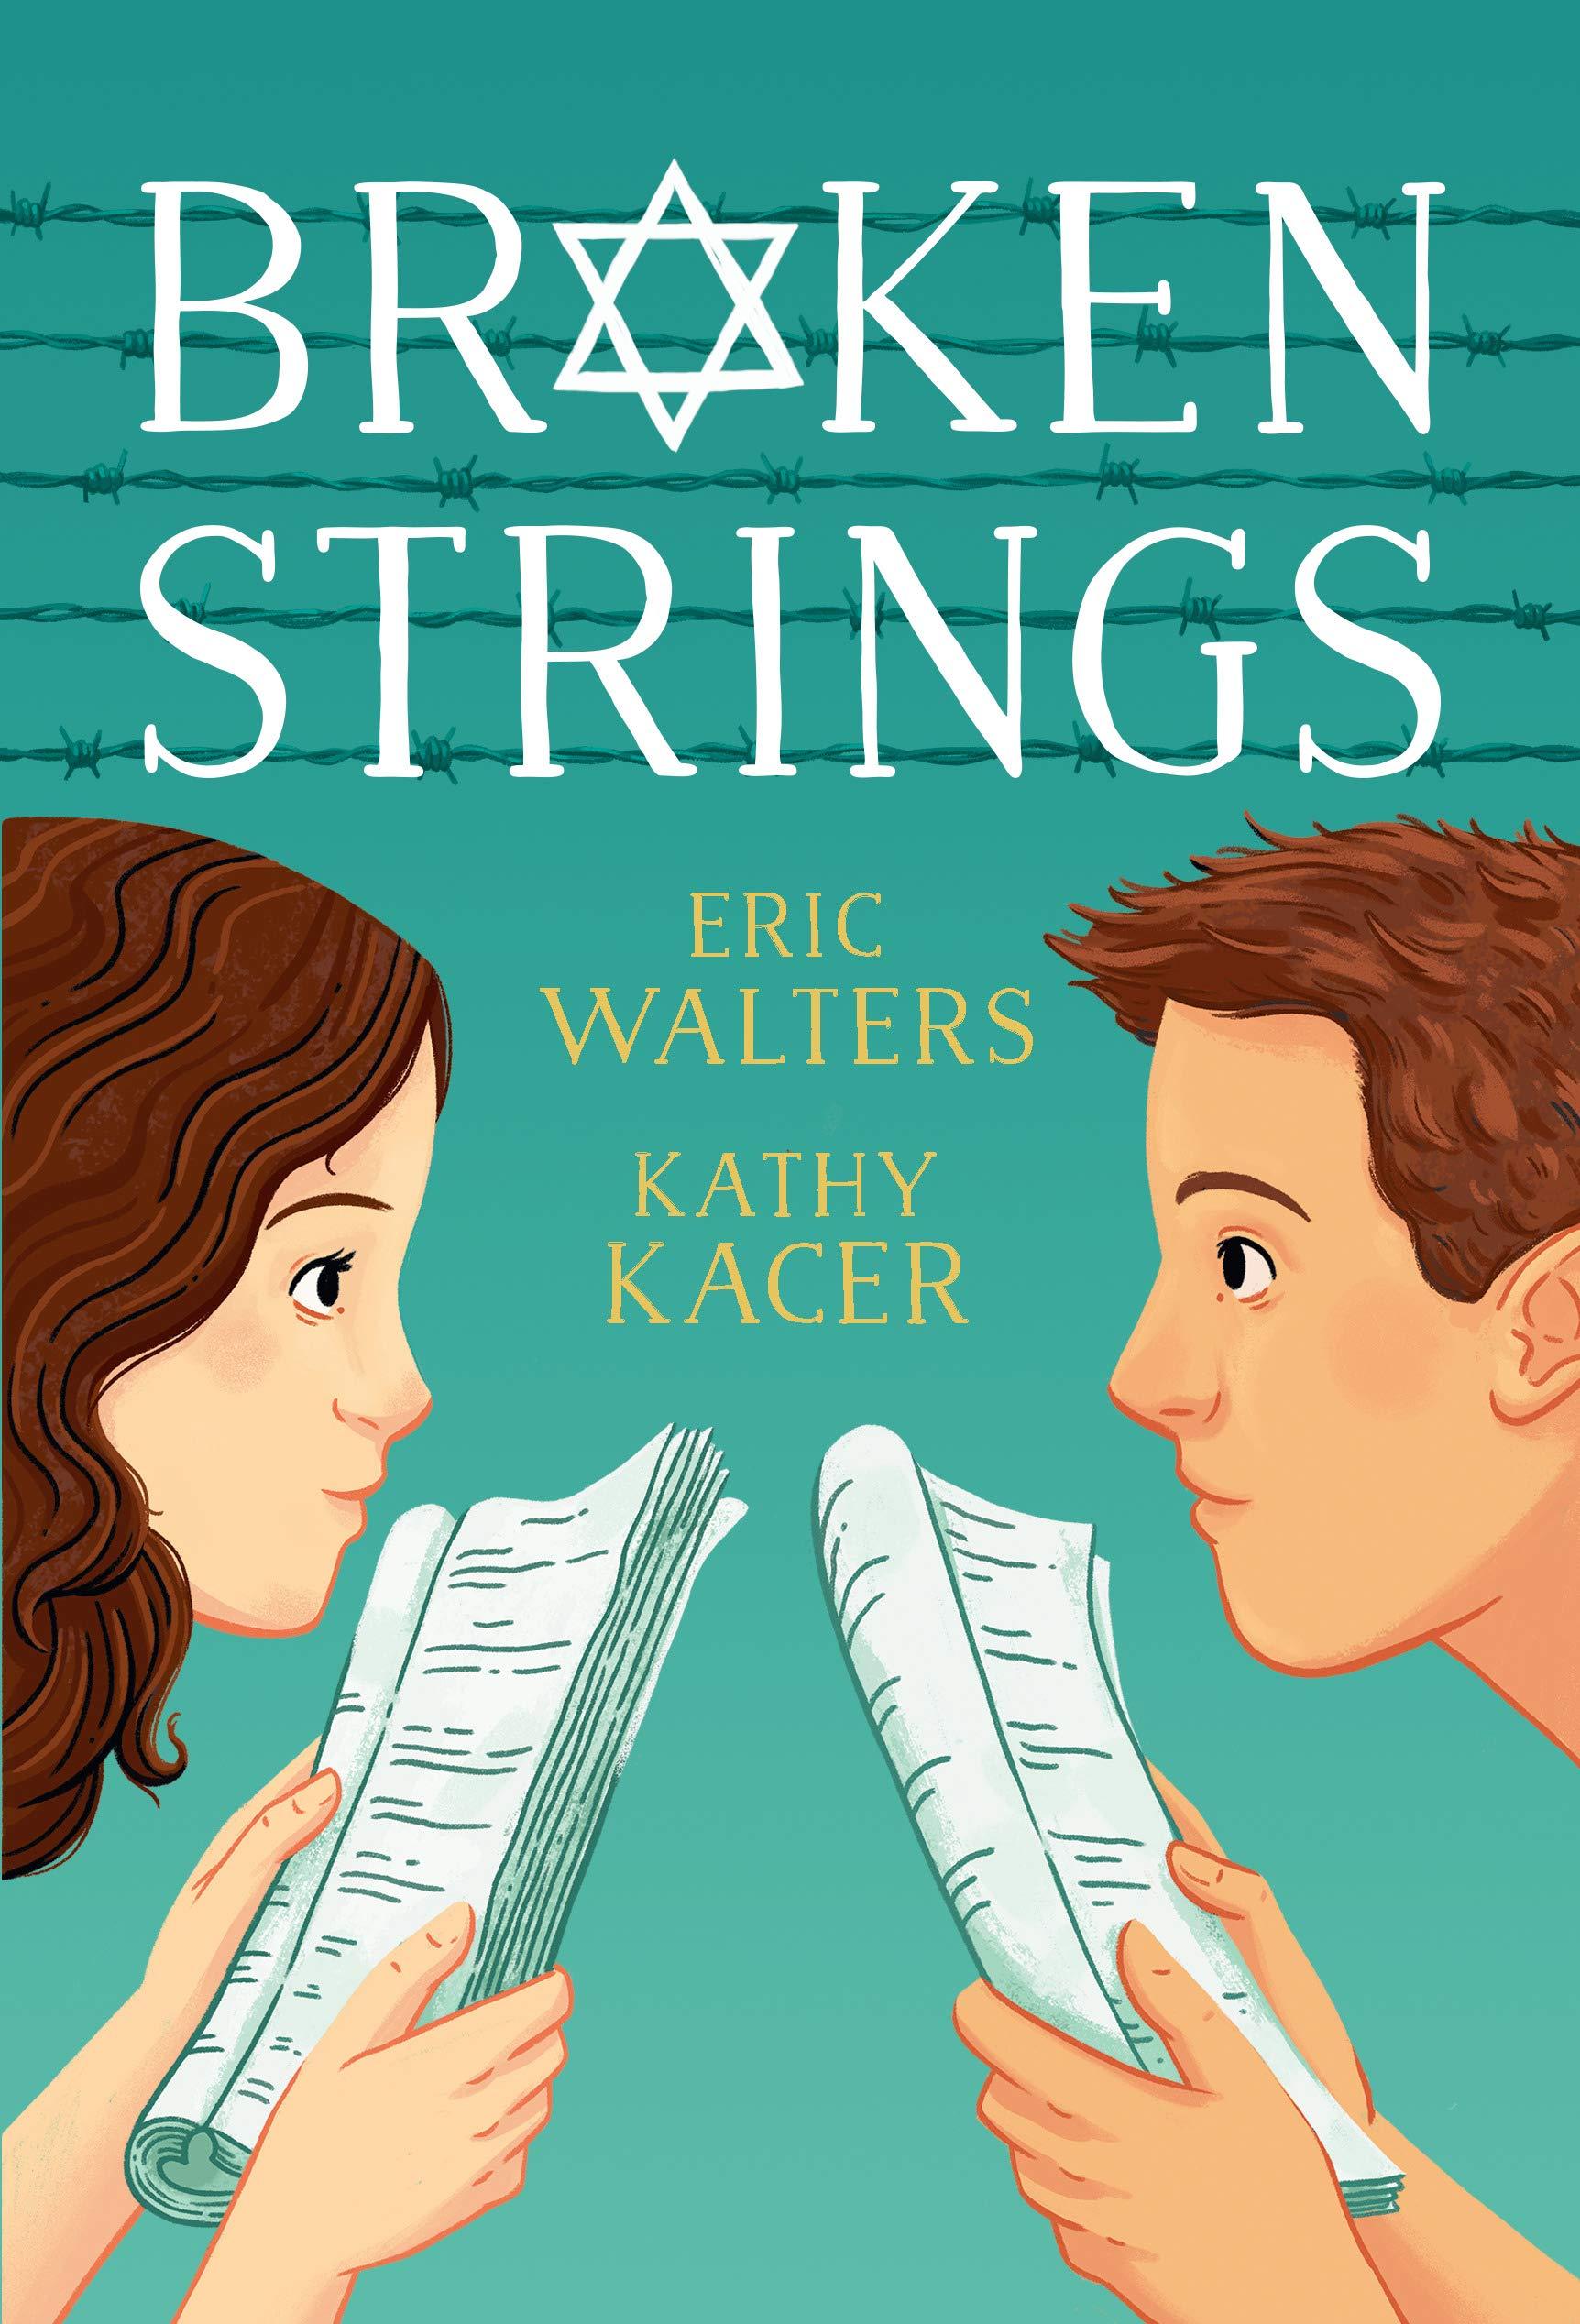 Image result for broken strings eric walters